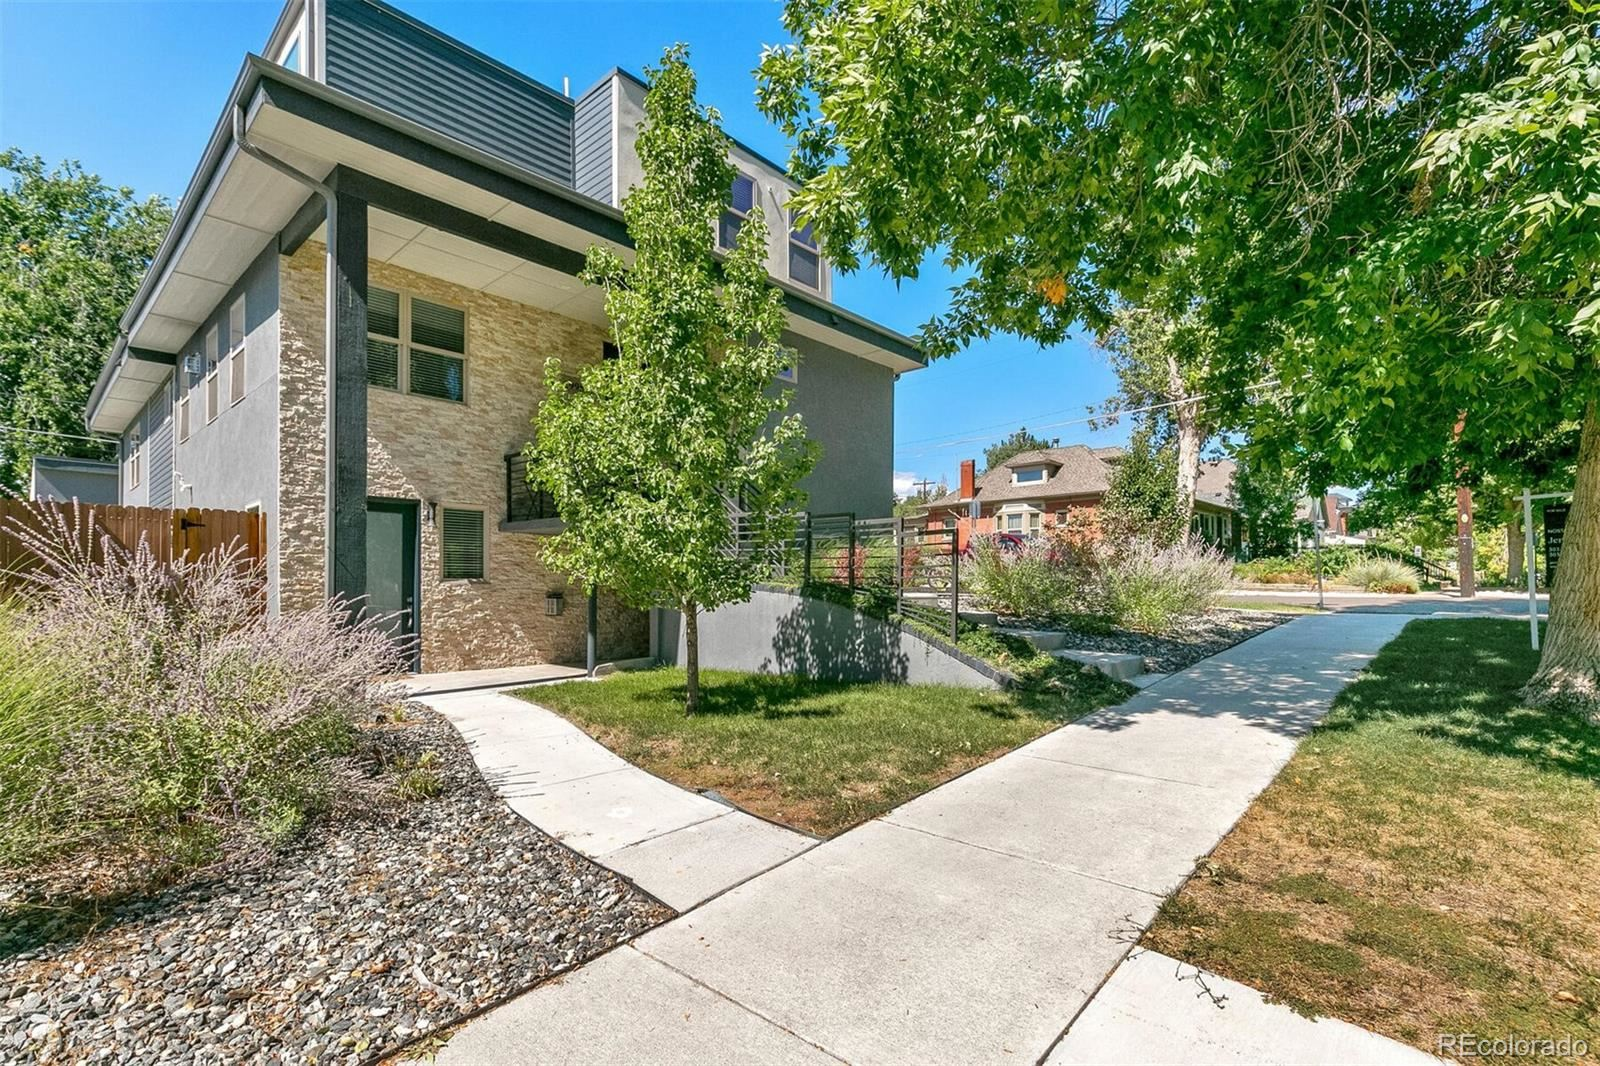 Photo of 2995 Osceola Street, Denver, CO 80212 (MLS # 7776138)